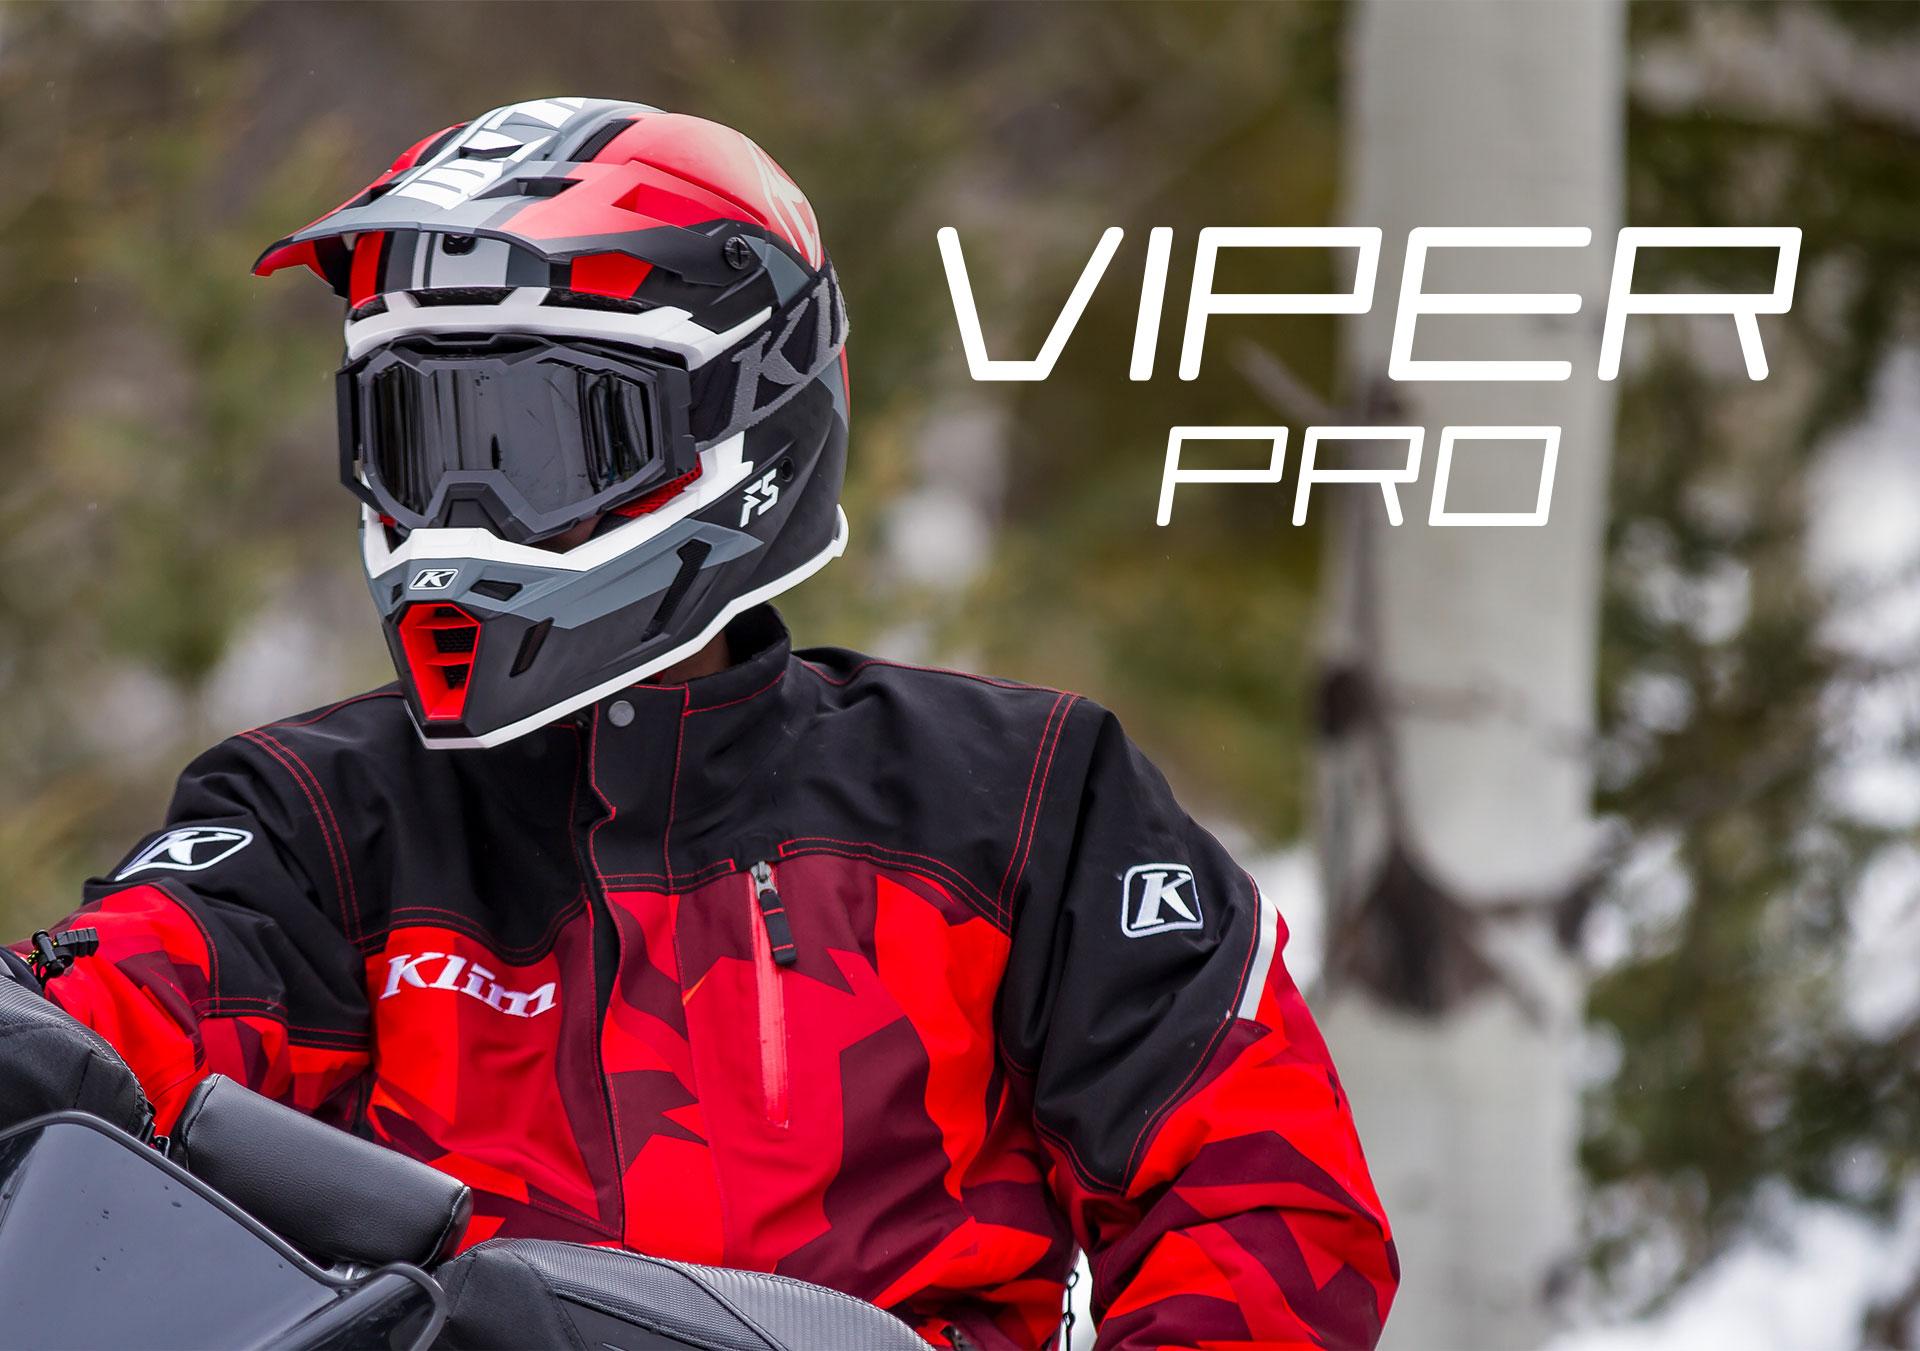 Viper-Pro1